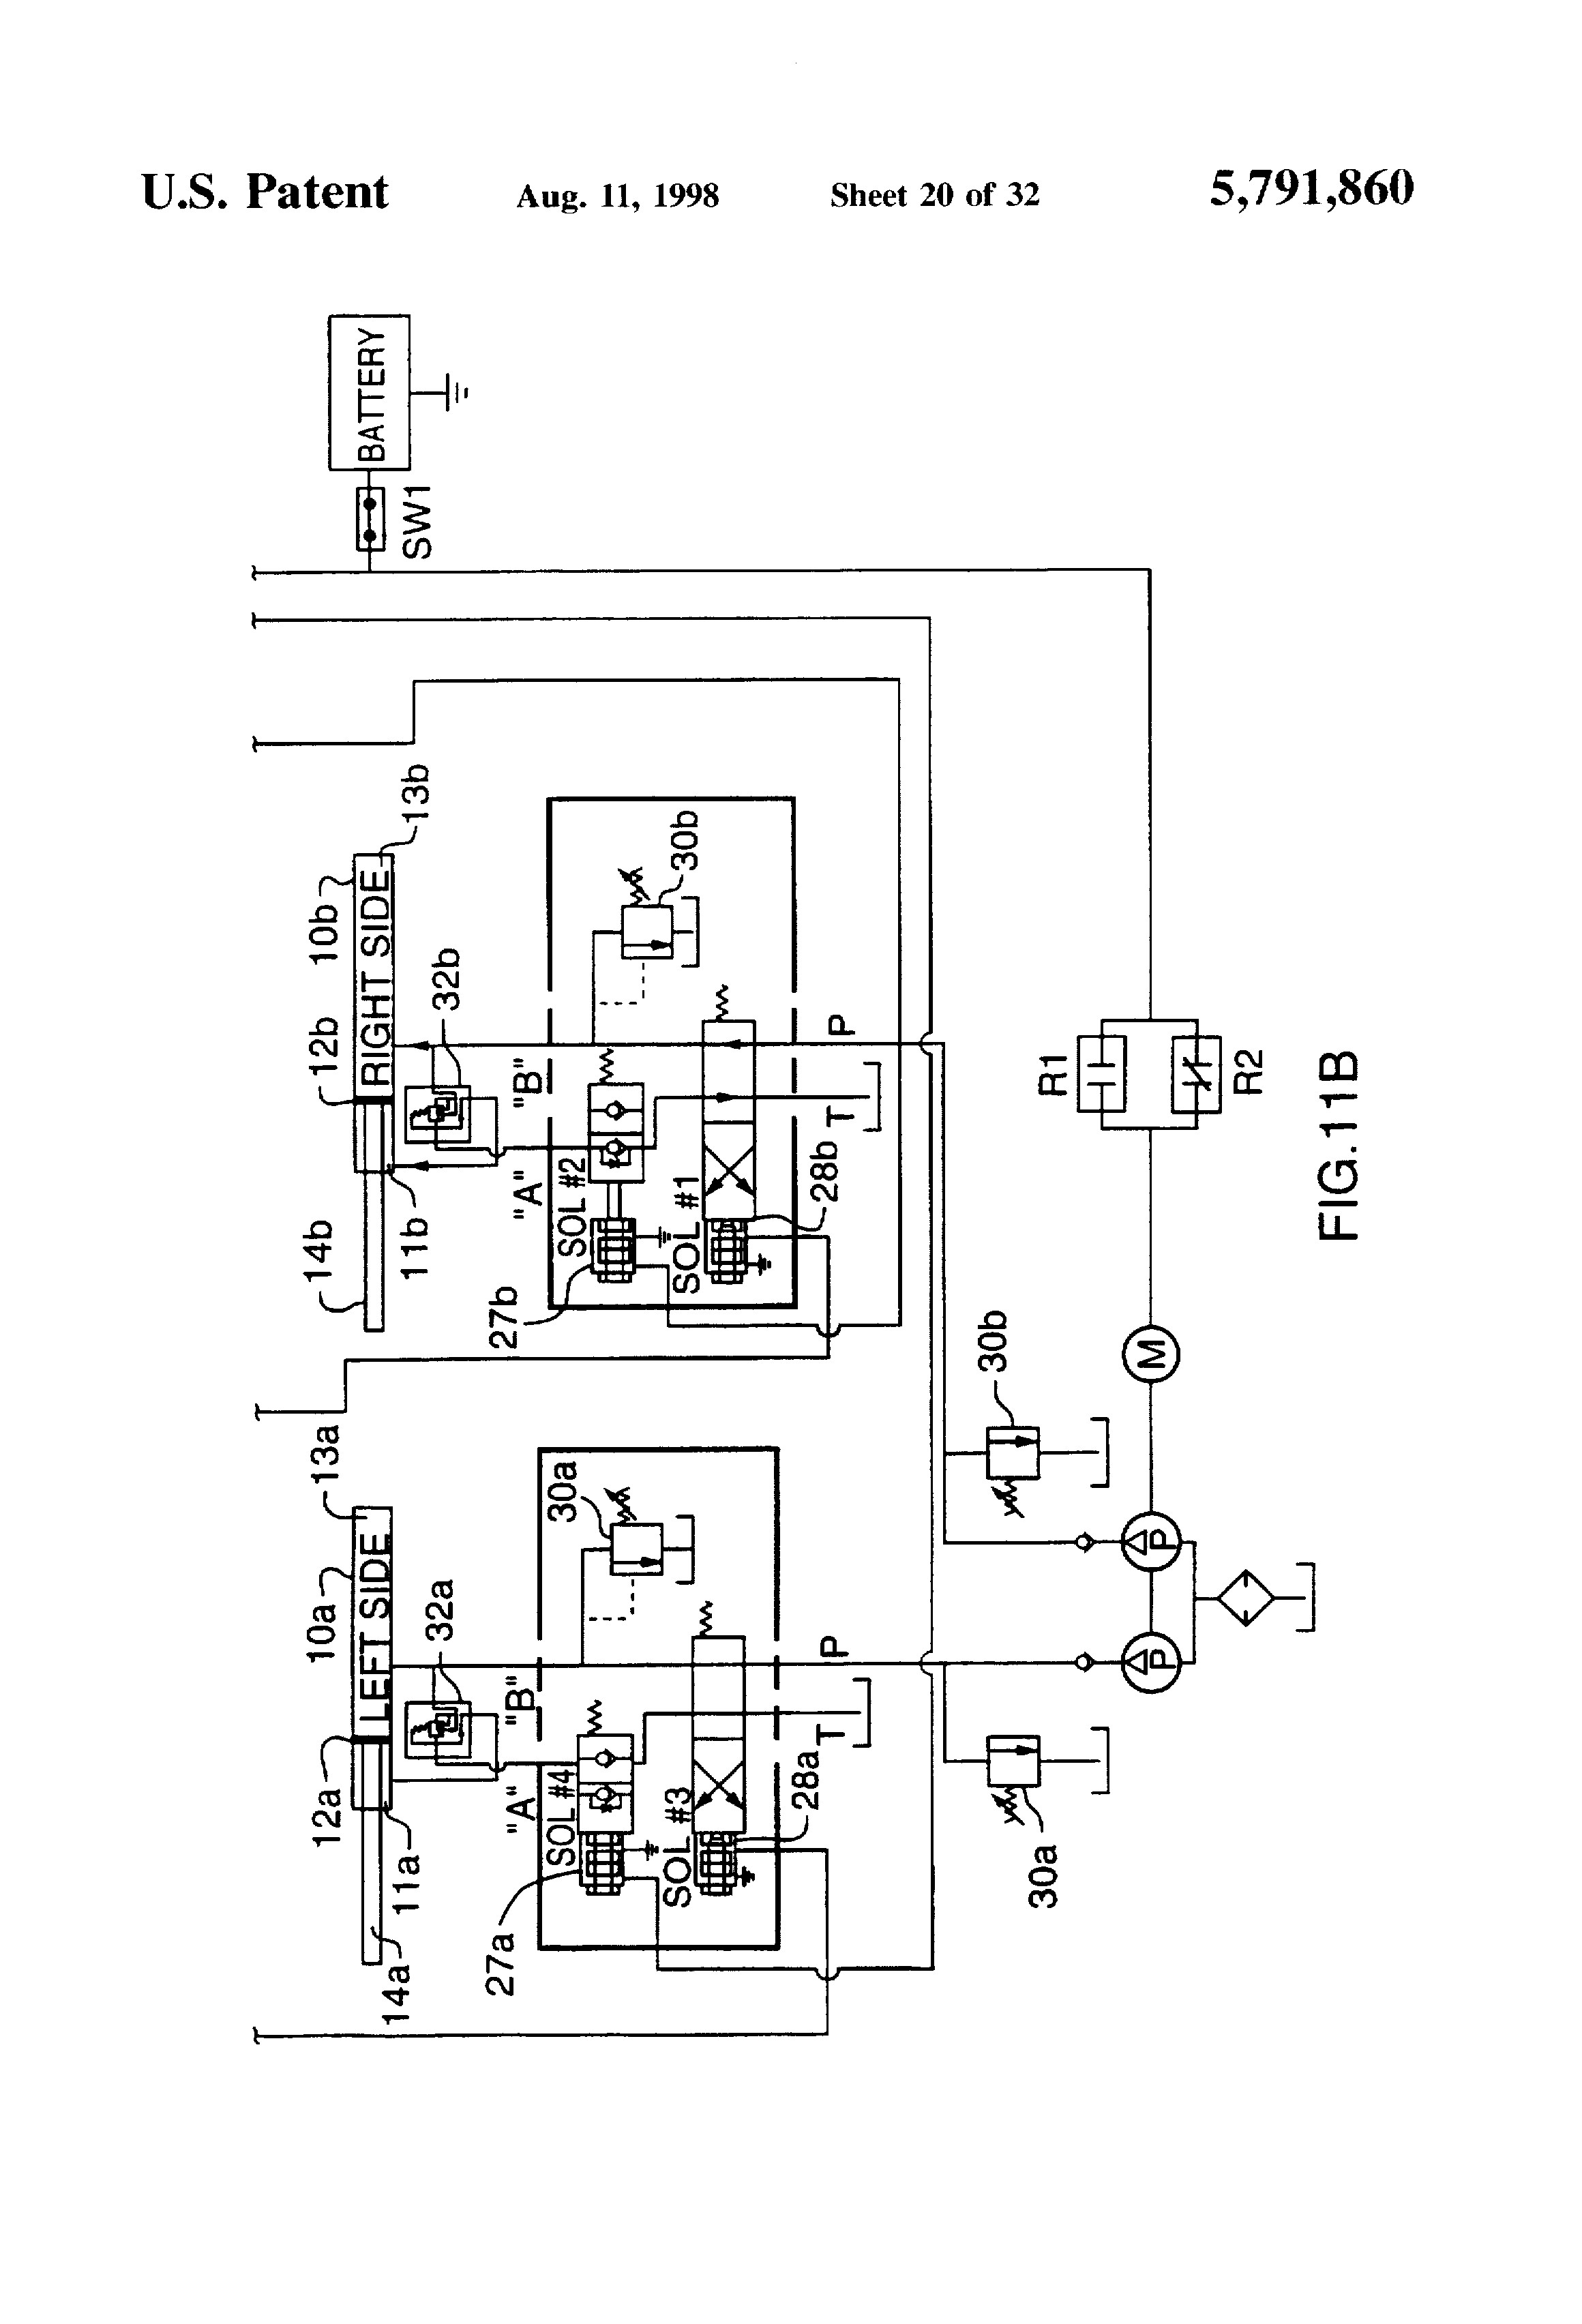 bunker hill security camera 95914 schematic